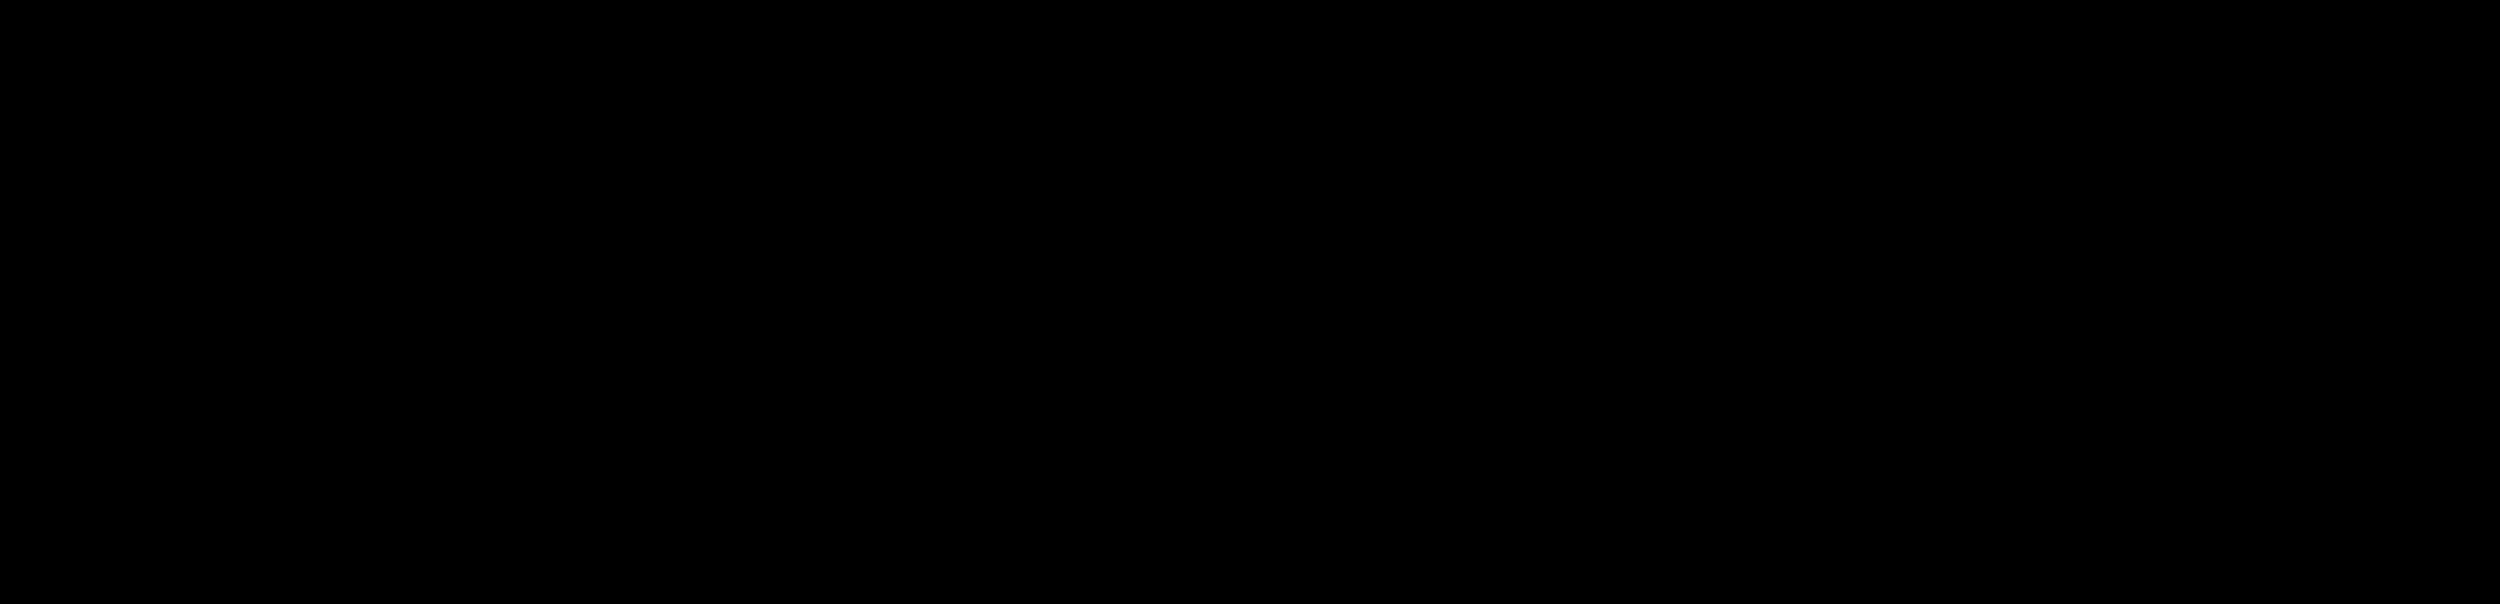 Continental_logo_black.png